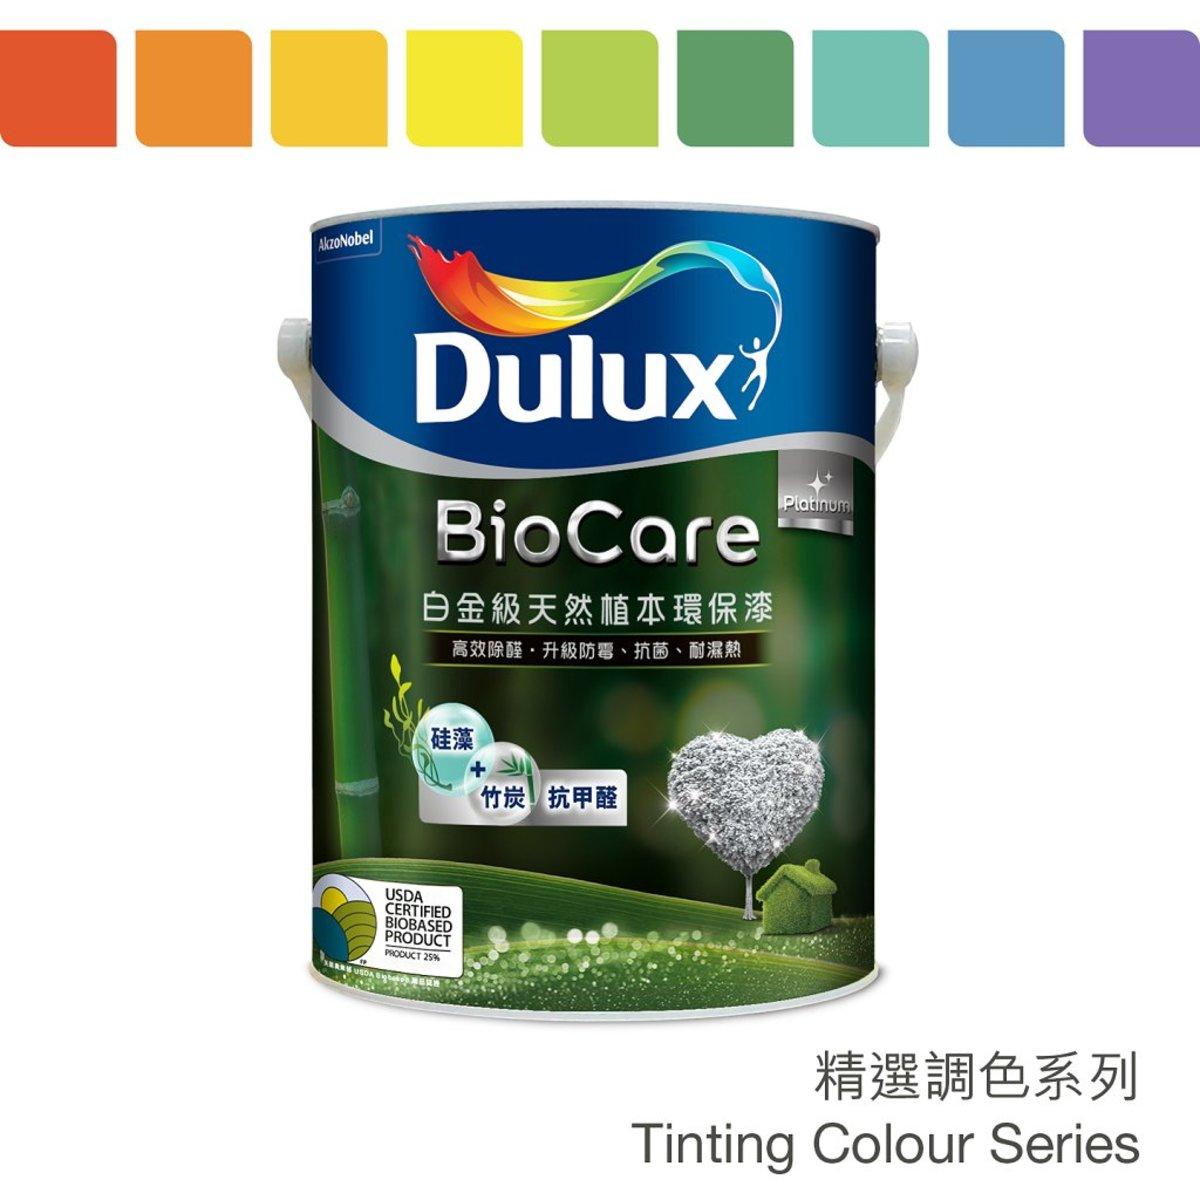 Dulux Paint Mixing Matt Emulsion 1 - 5L   1200x1200